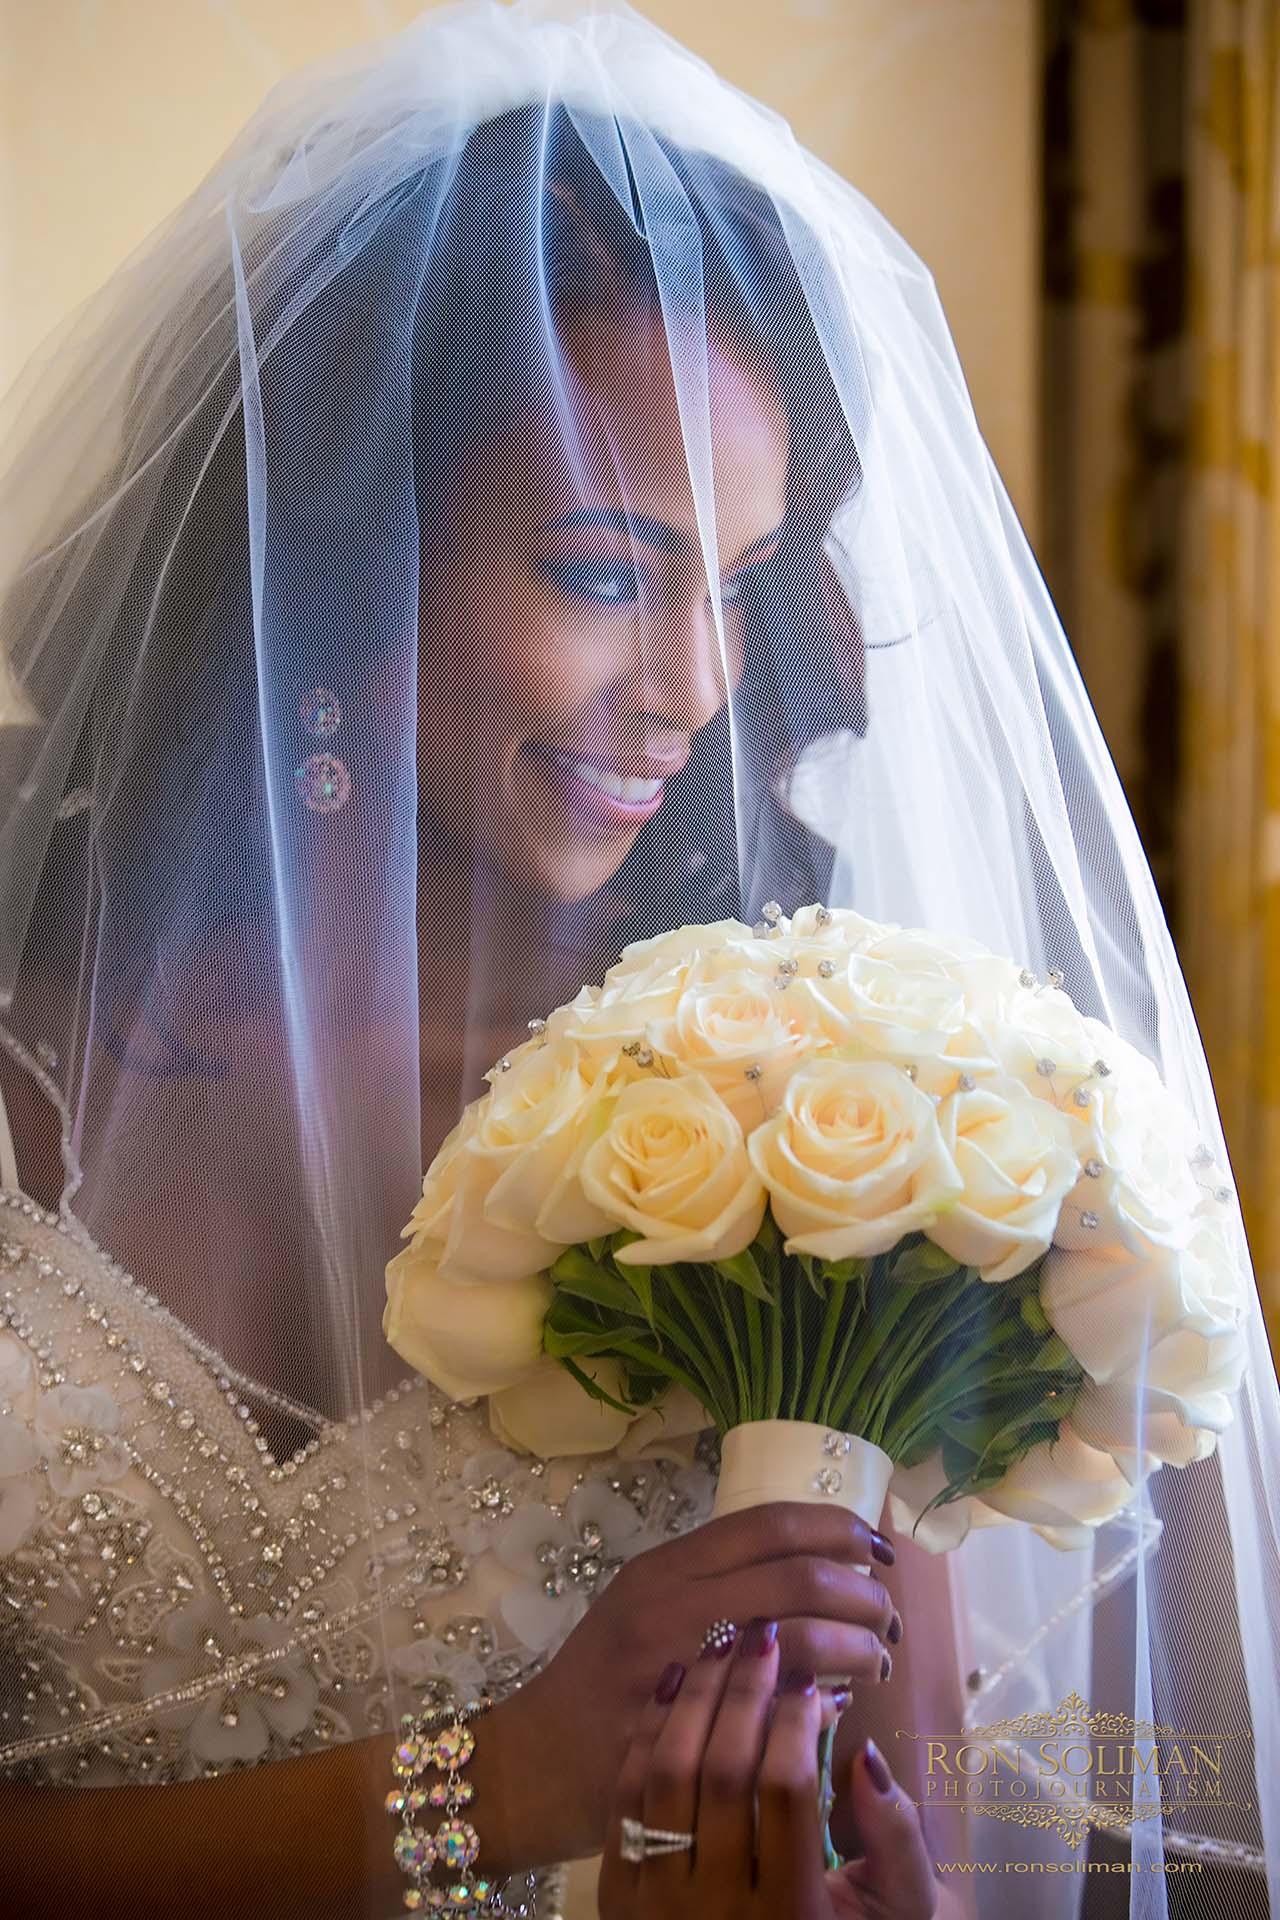 Philadelphia celebrity wedding